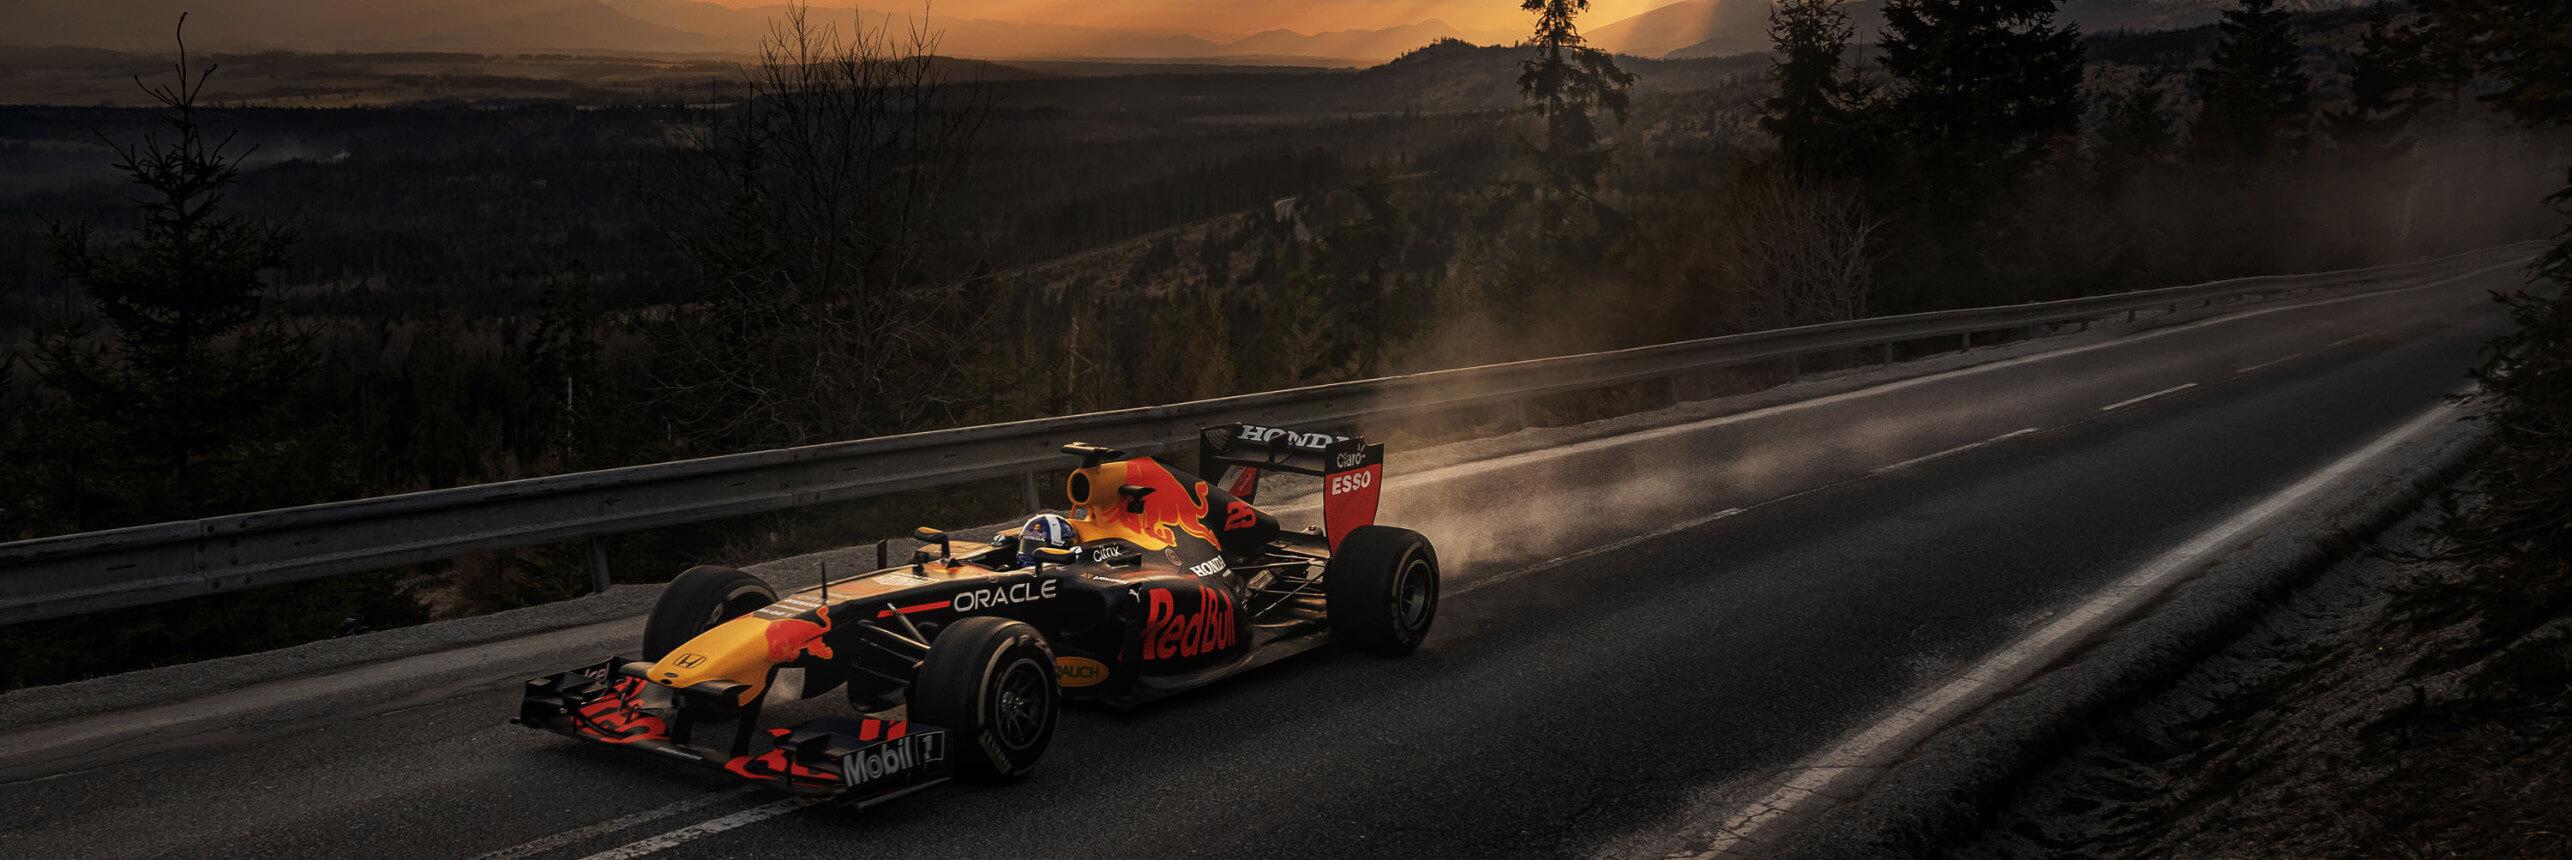 Formule 1 Česko-Slovenskem cestou necestou